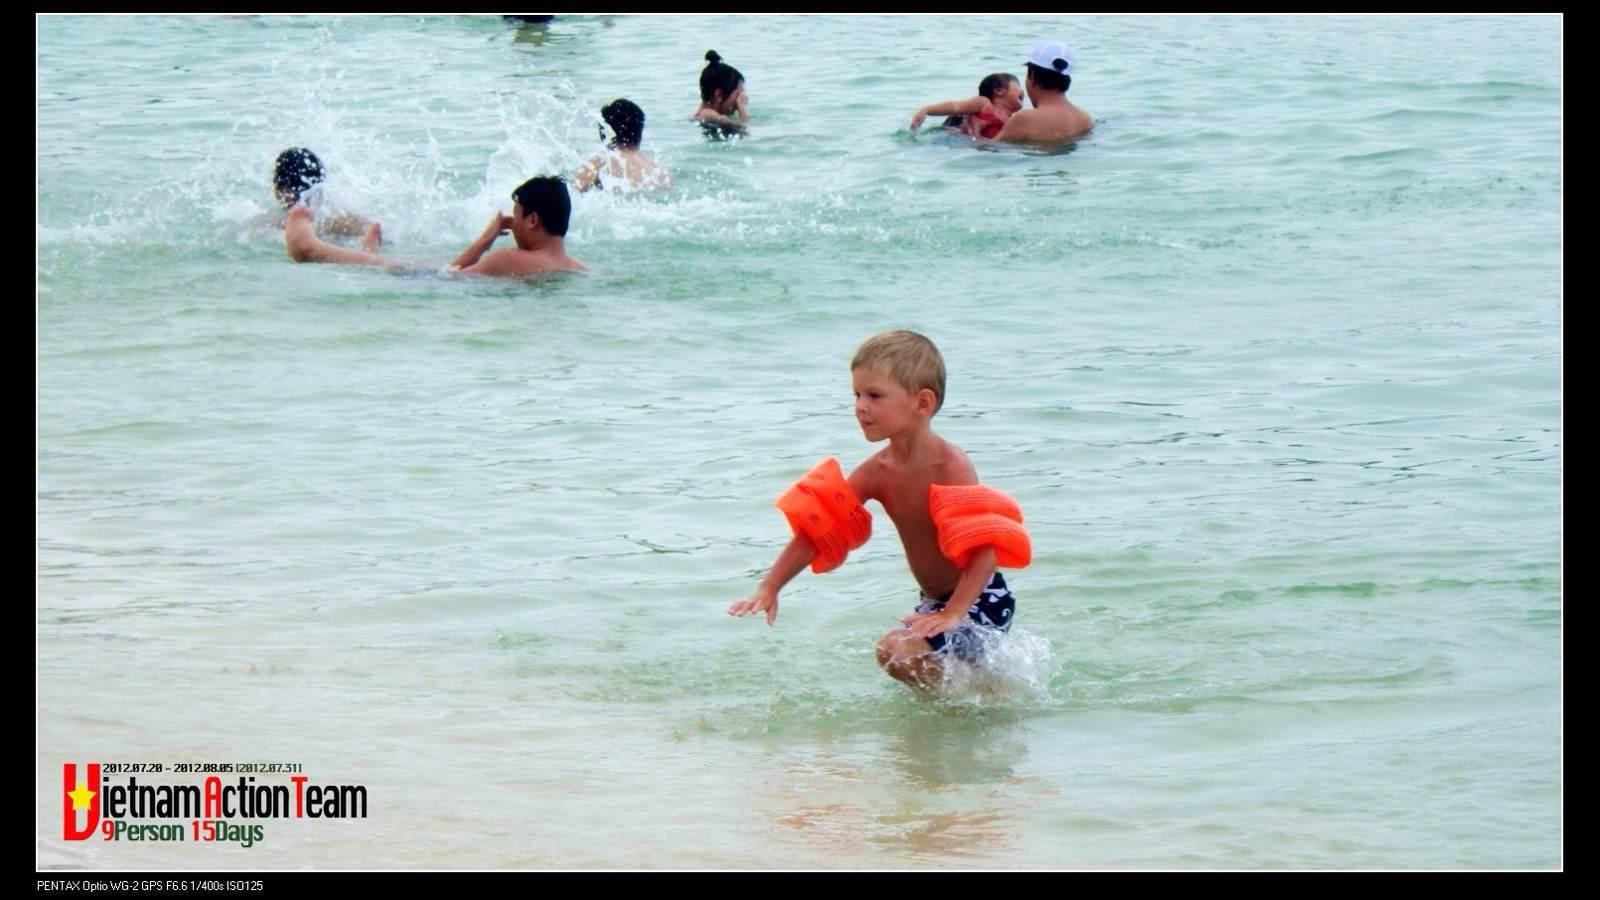 WWW_777SAO_COM_my lan酒店 bai sao beach沙滩